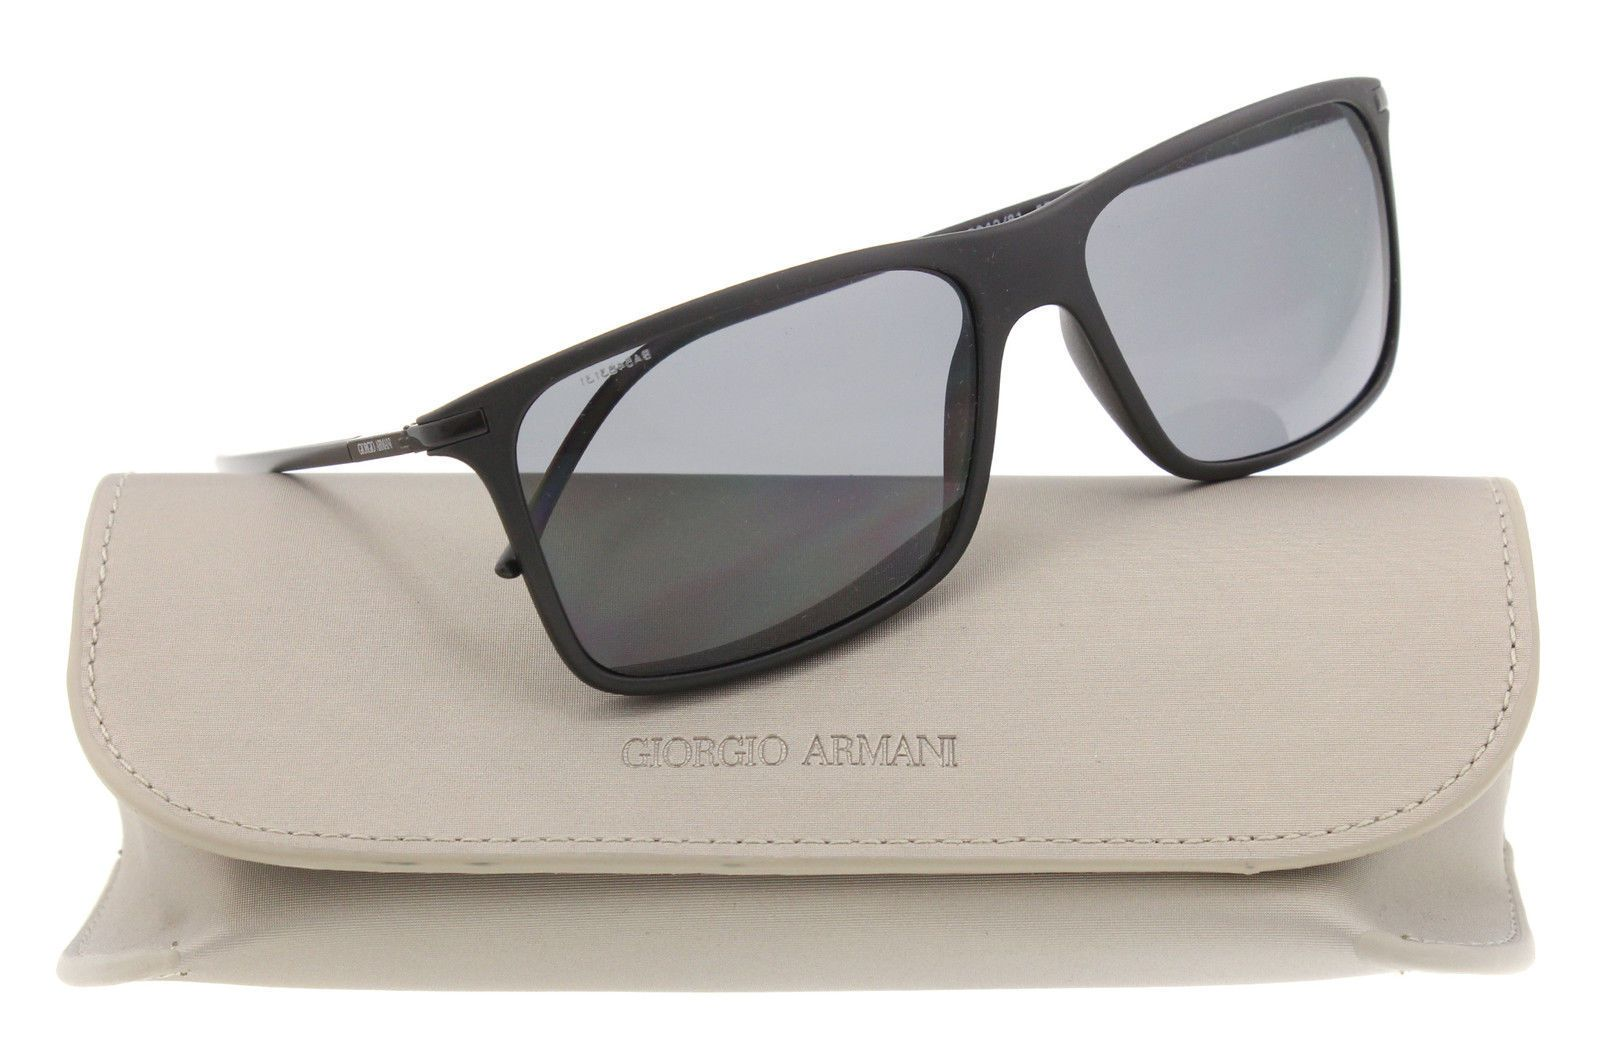 5b465eda62c New Giorgio Armani sunglasses Men Polarized AR 8034 Black 5042 81 AR8034  57mm